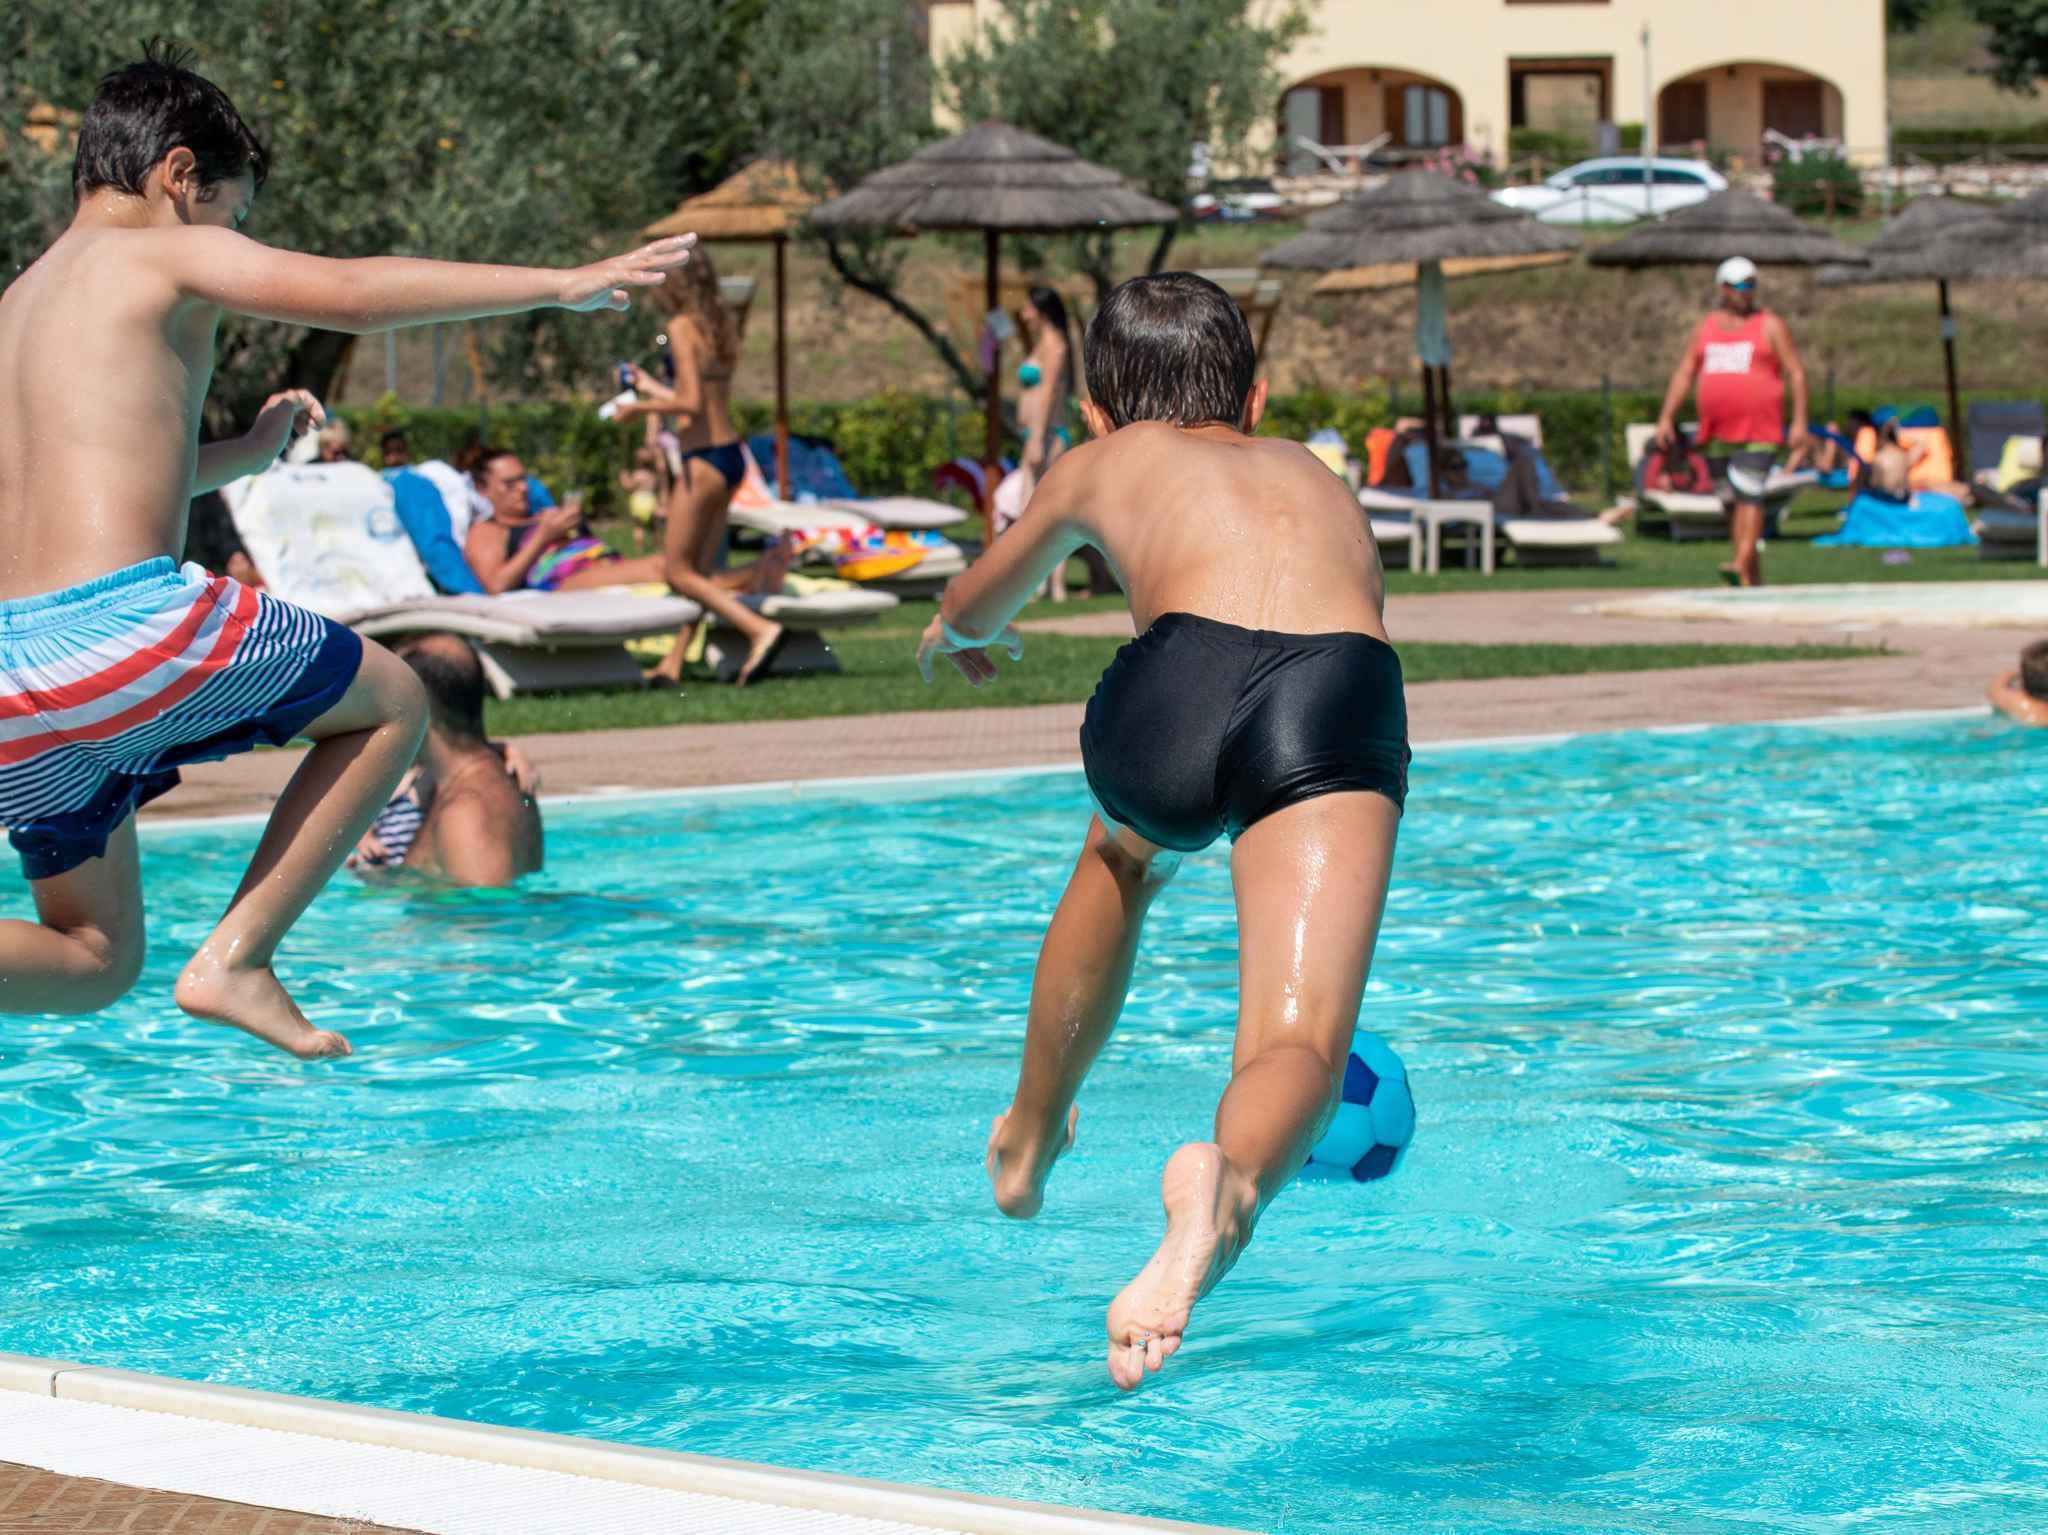 Ferienwohnung with Pool (1710369), Suvereto, Livorno, Toskana, Italien, Bild 9